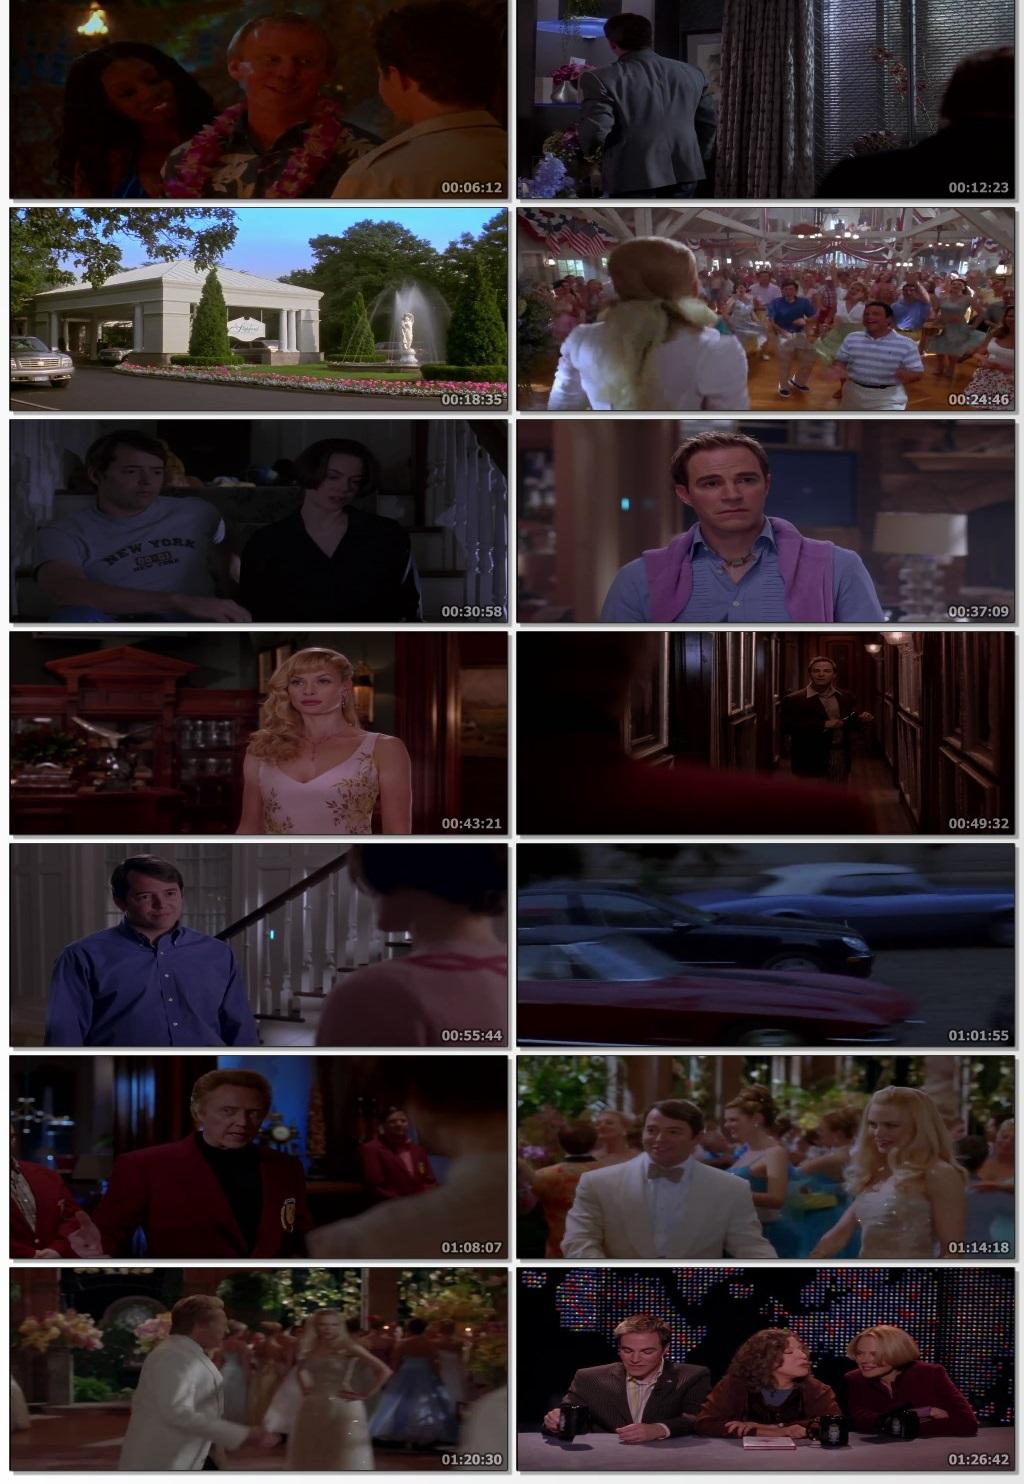 The-Stepford-Wives-2004-www-1kmovies-icu-Hindi-Dual-Audio-720p-Blu-Ray-ESub-720-MB-mkv-thumbs-1